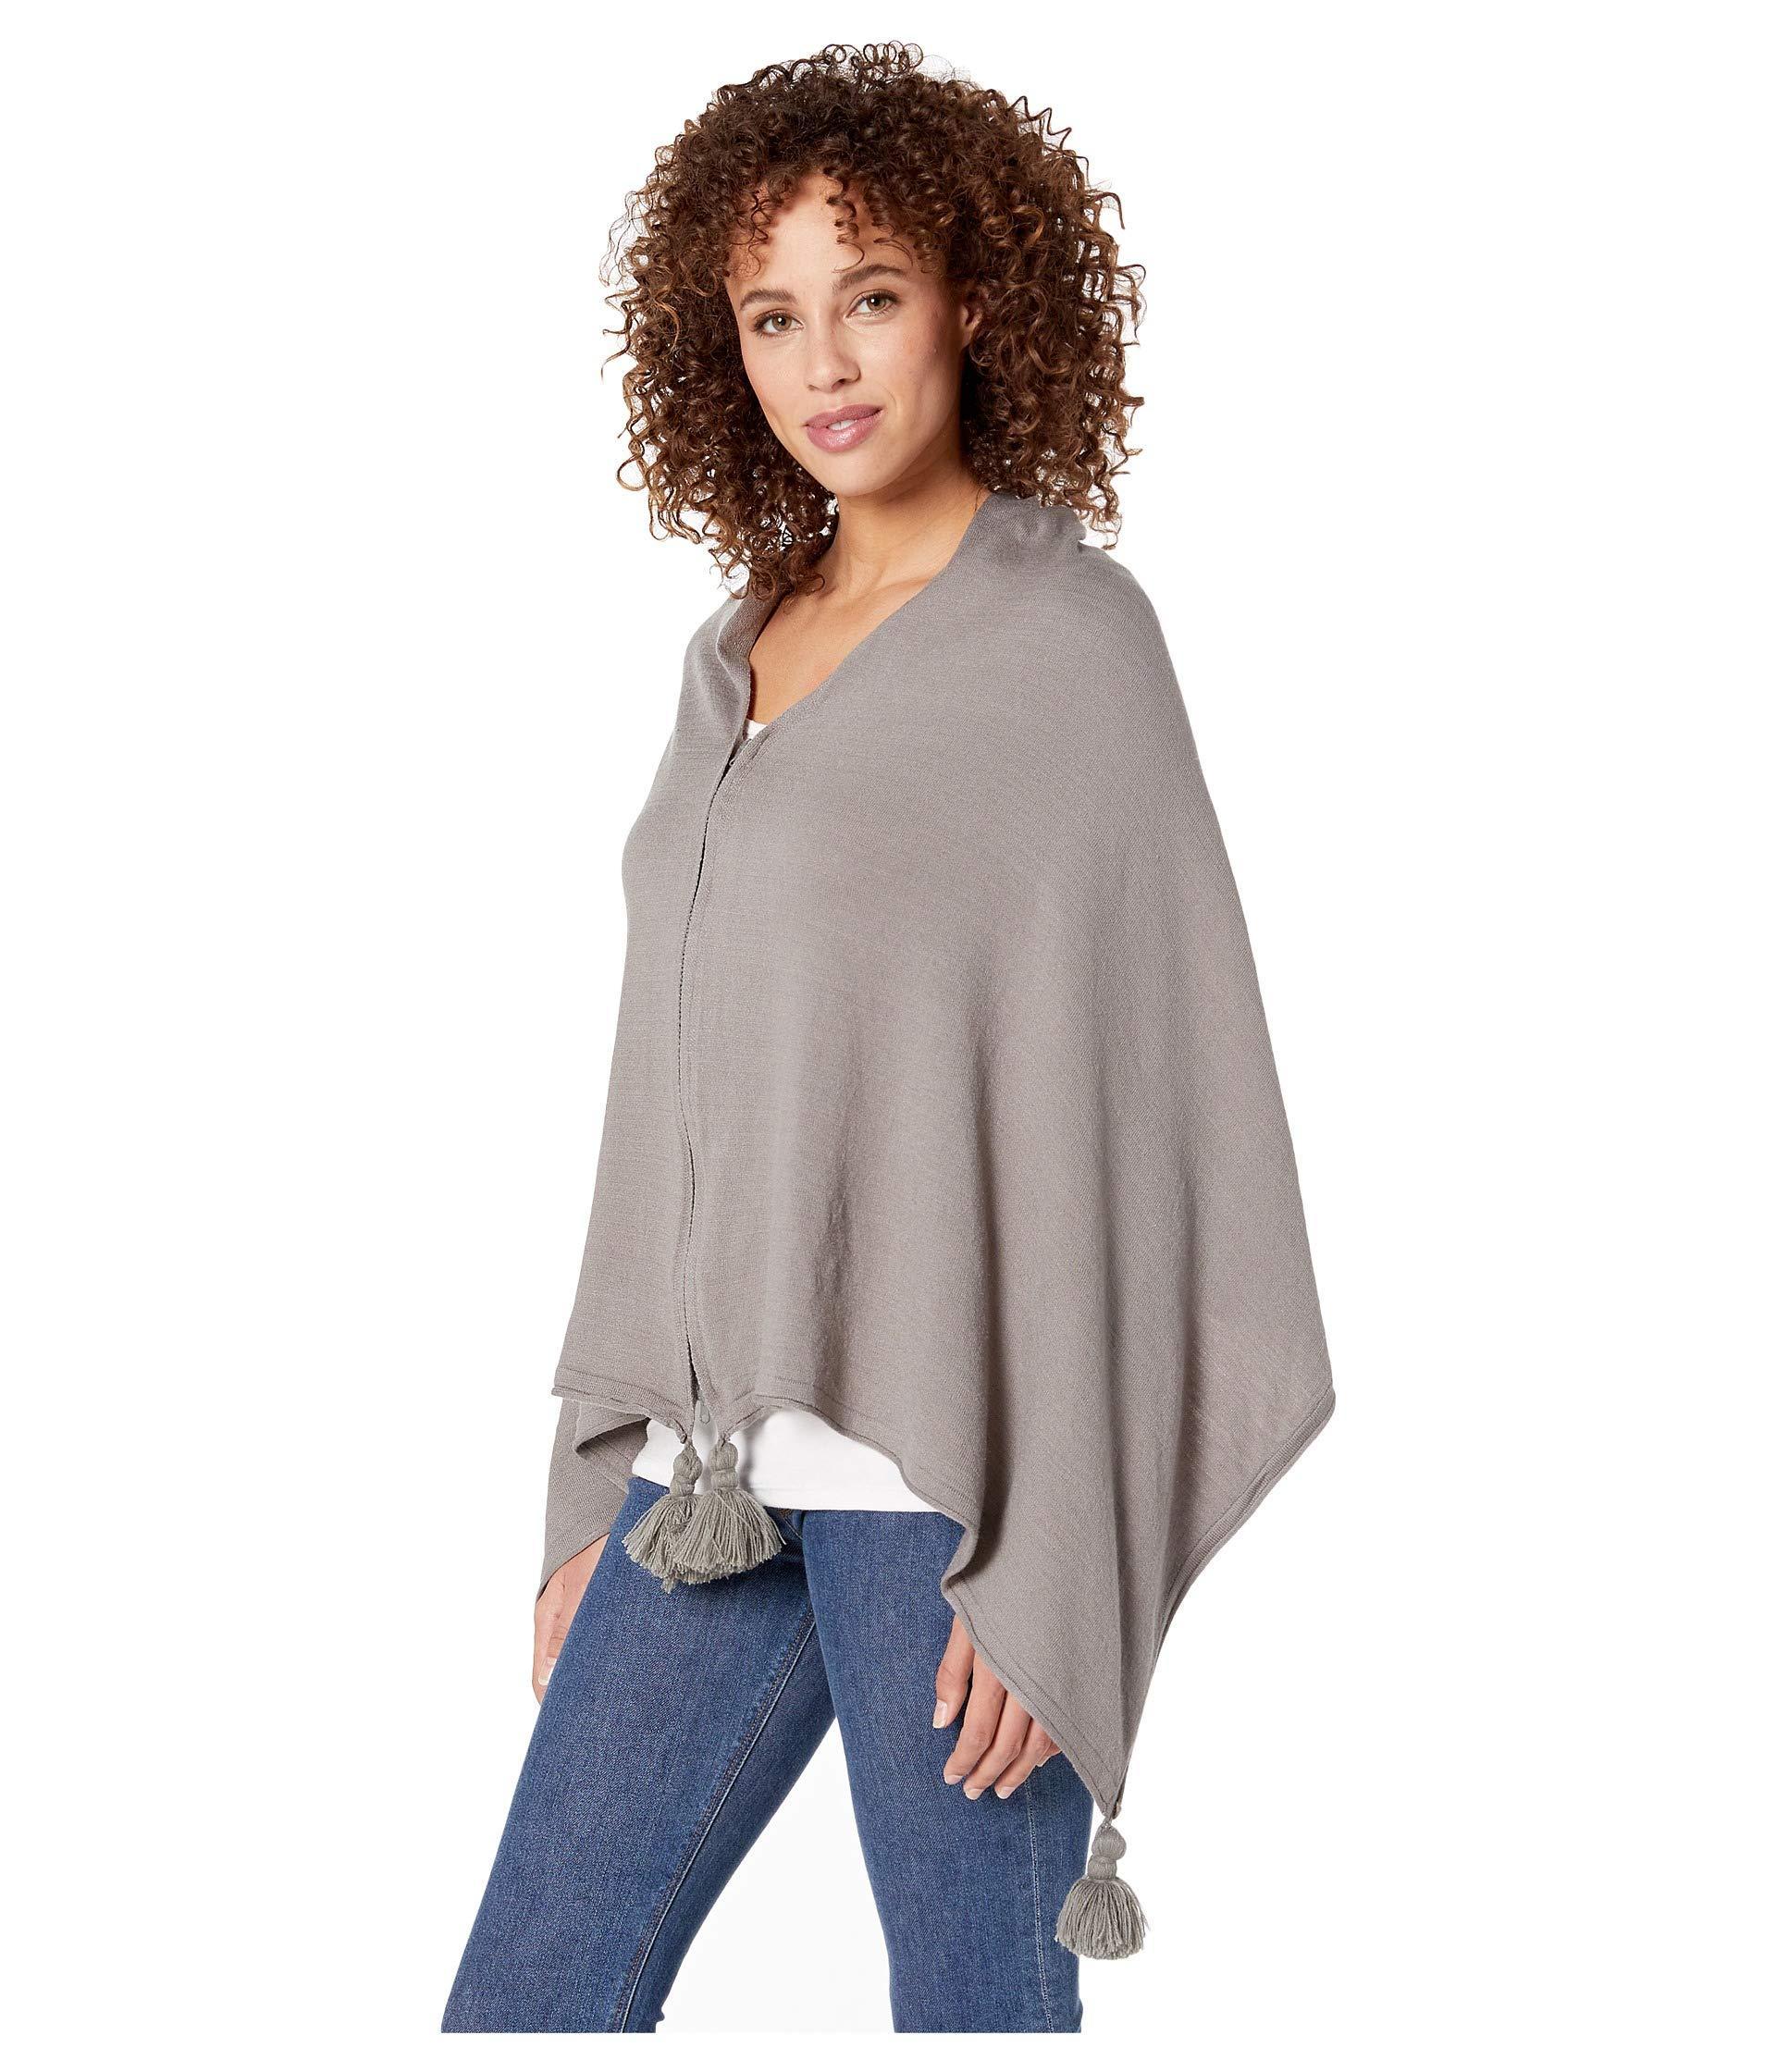 21756ac46fe Lyst - Michael Stars Tomlin Knit Tasseled Wrap (heather Grey) Scarves in  Gray